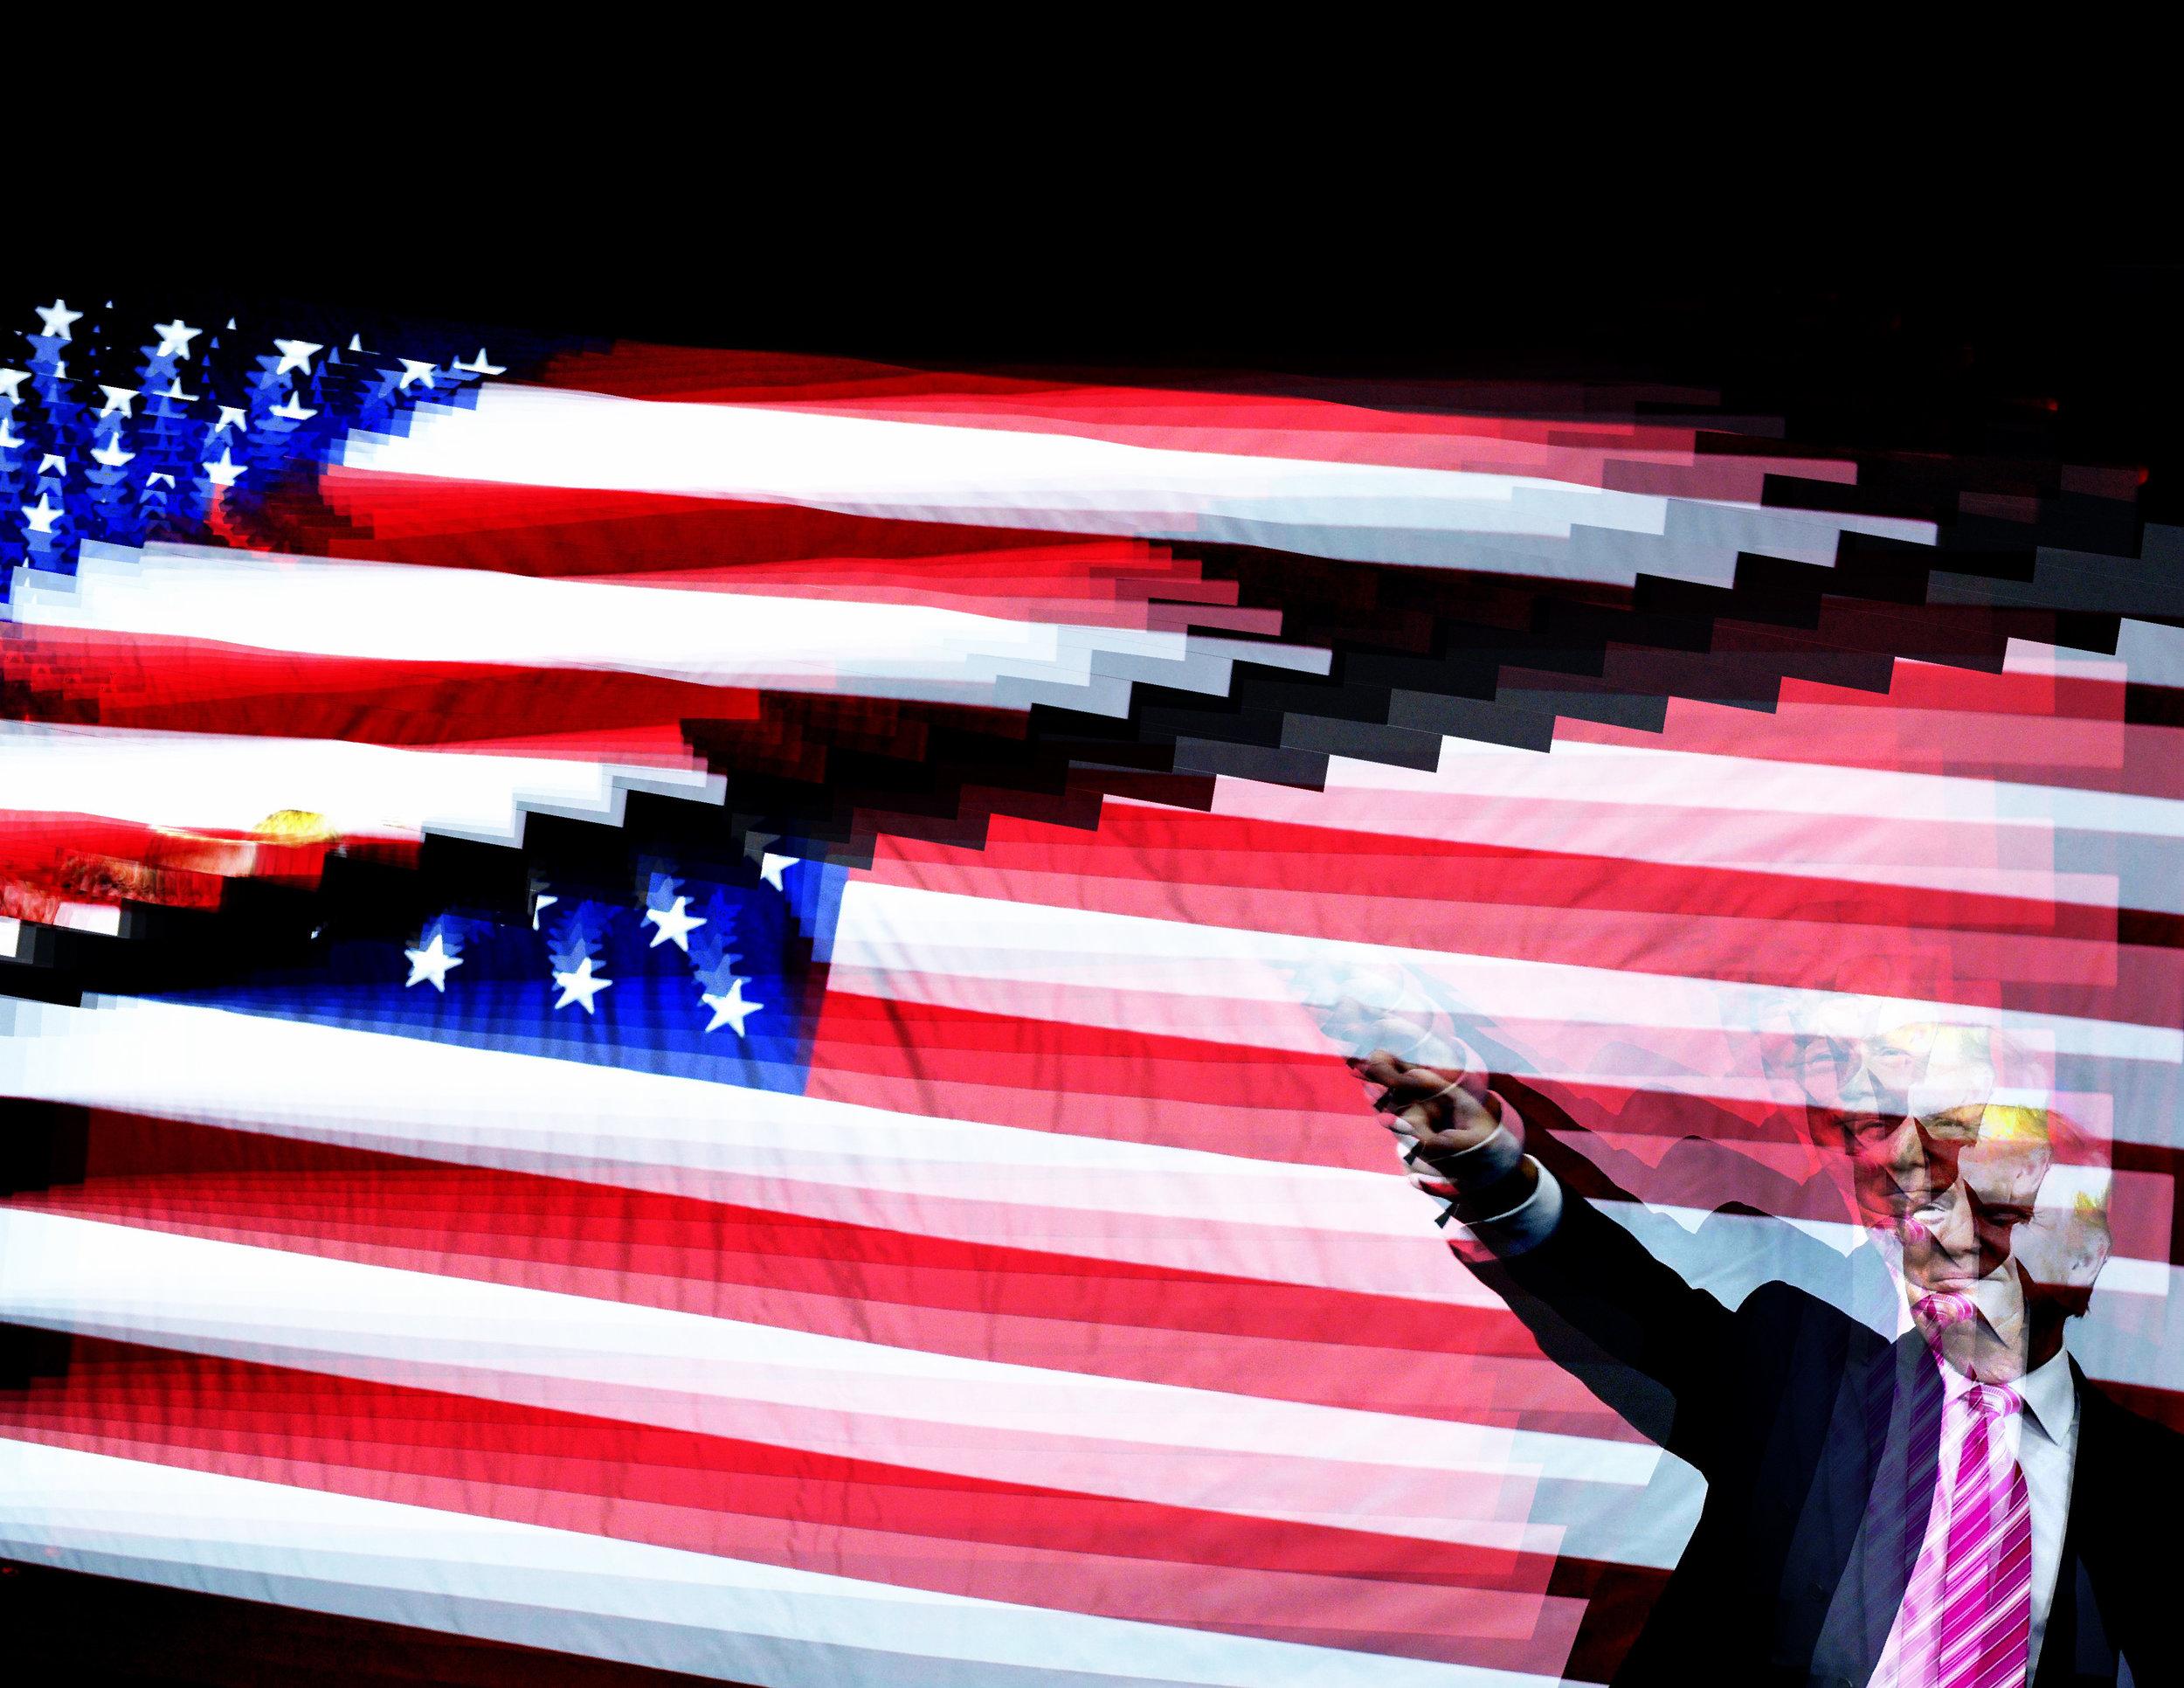 Sundered Flag, 2017. Destructive editing of a digital file via glitch technique.Original photograph by Mandel Ngan, Getty Images